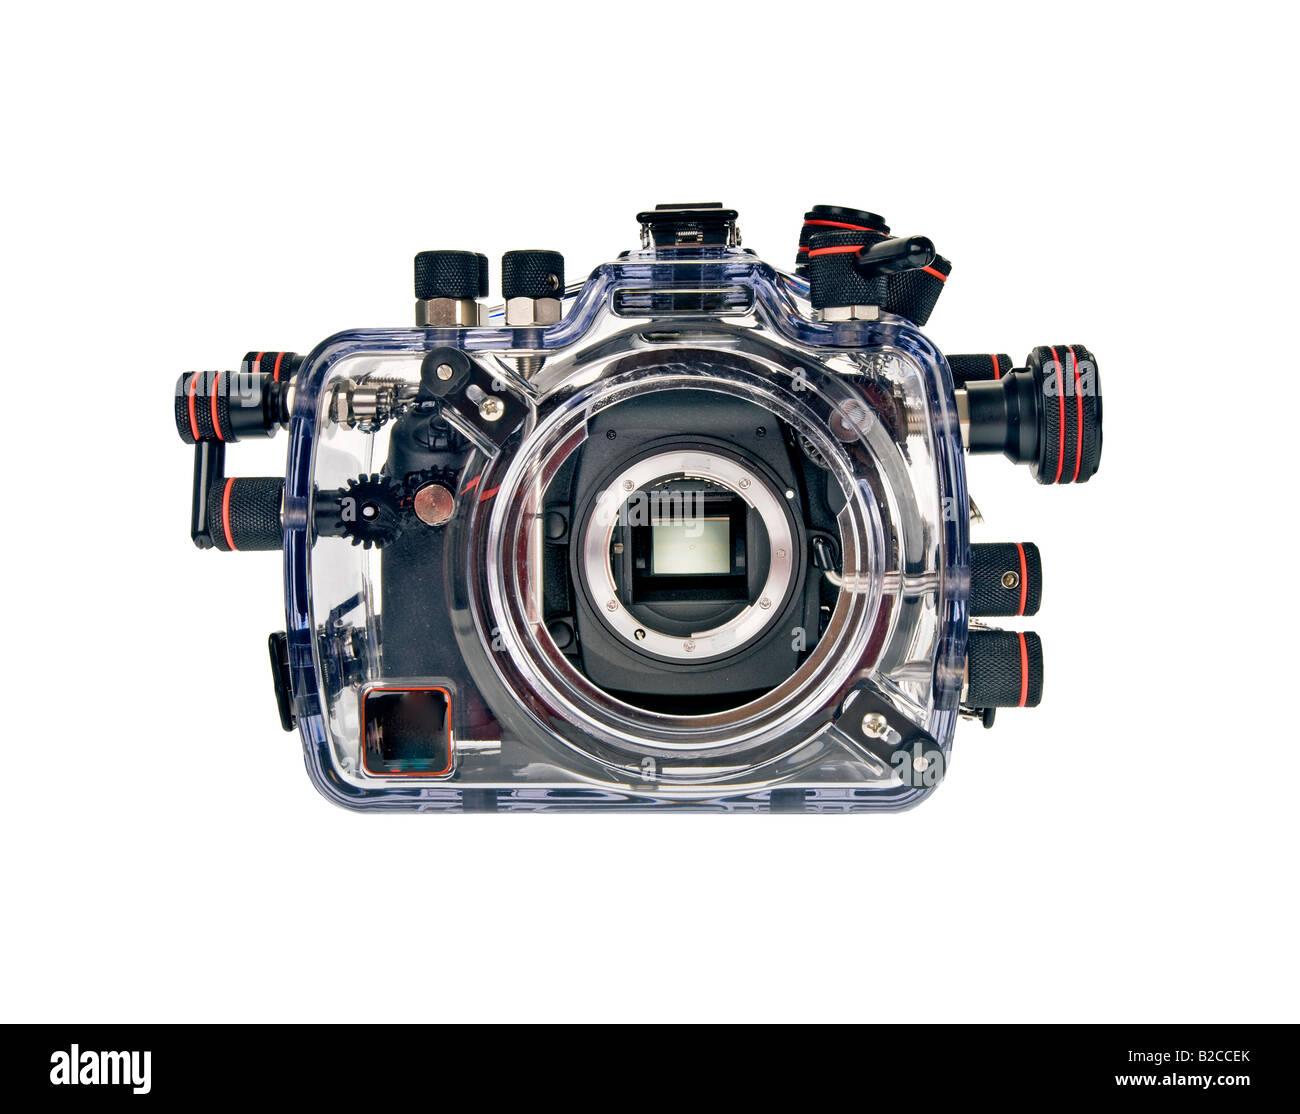 underwater camerahousing housing with Camera reflex single lense reflex SLR digital camera without lense look at - Stock Image